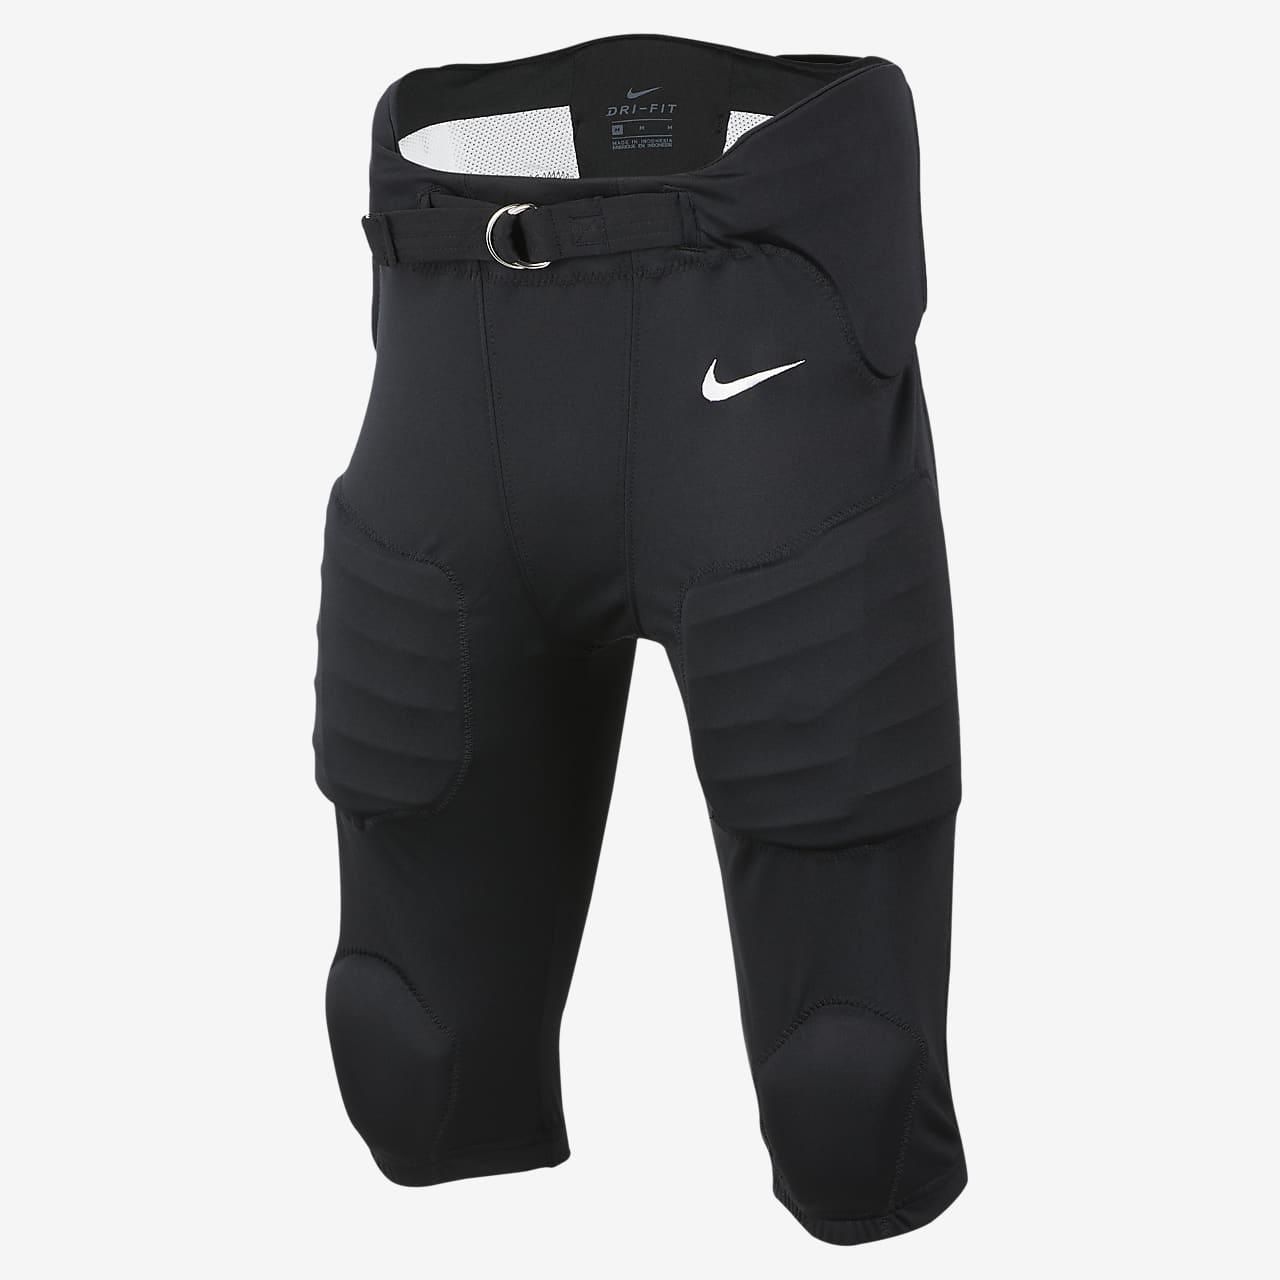 Pantalones de fútbol para niños talla grande Nike Recruit 3.0